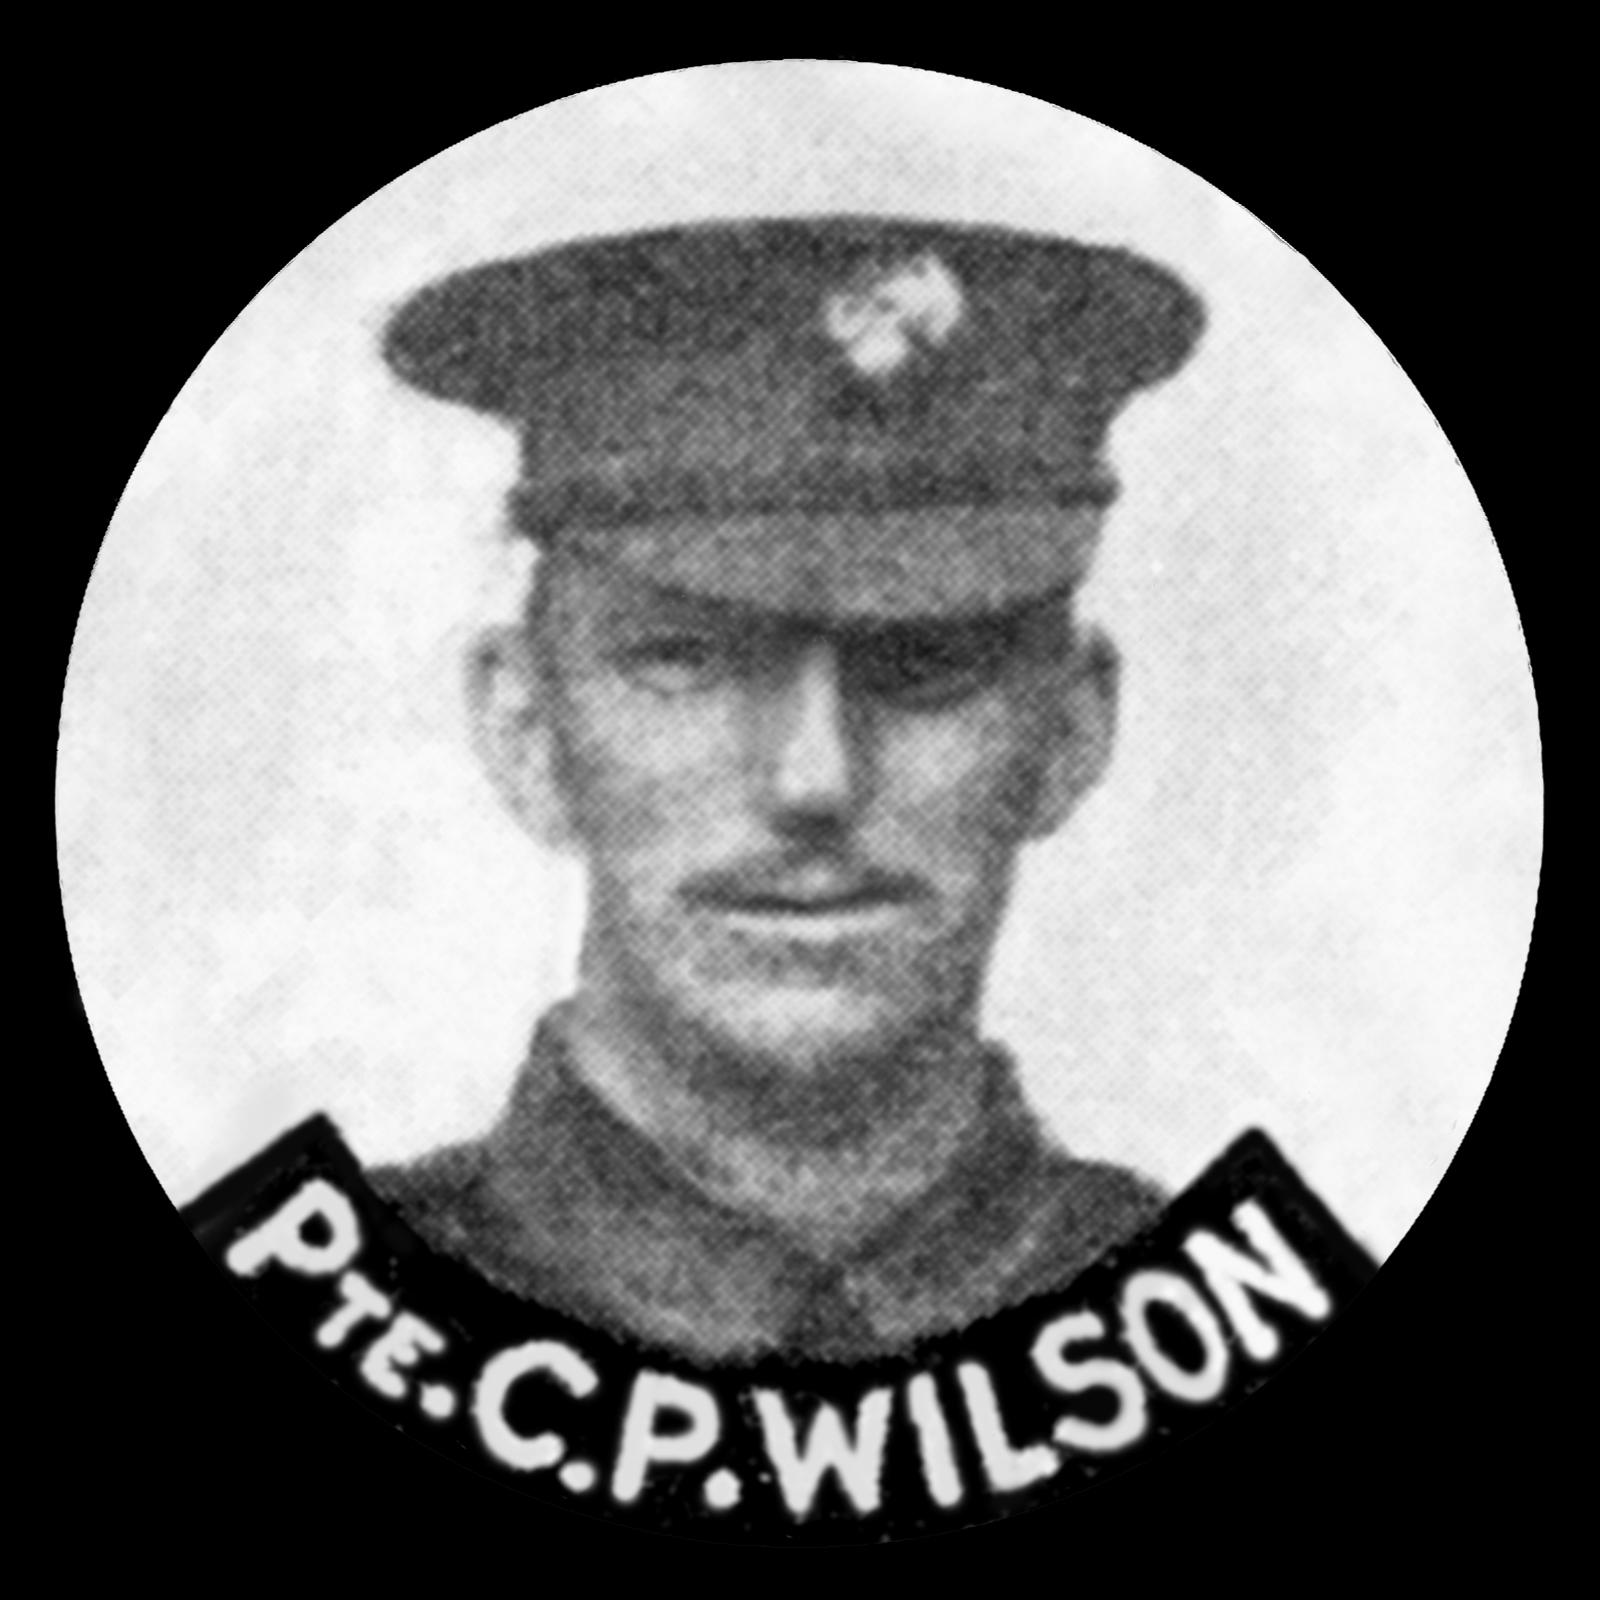 WILSON Charles Parkis